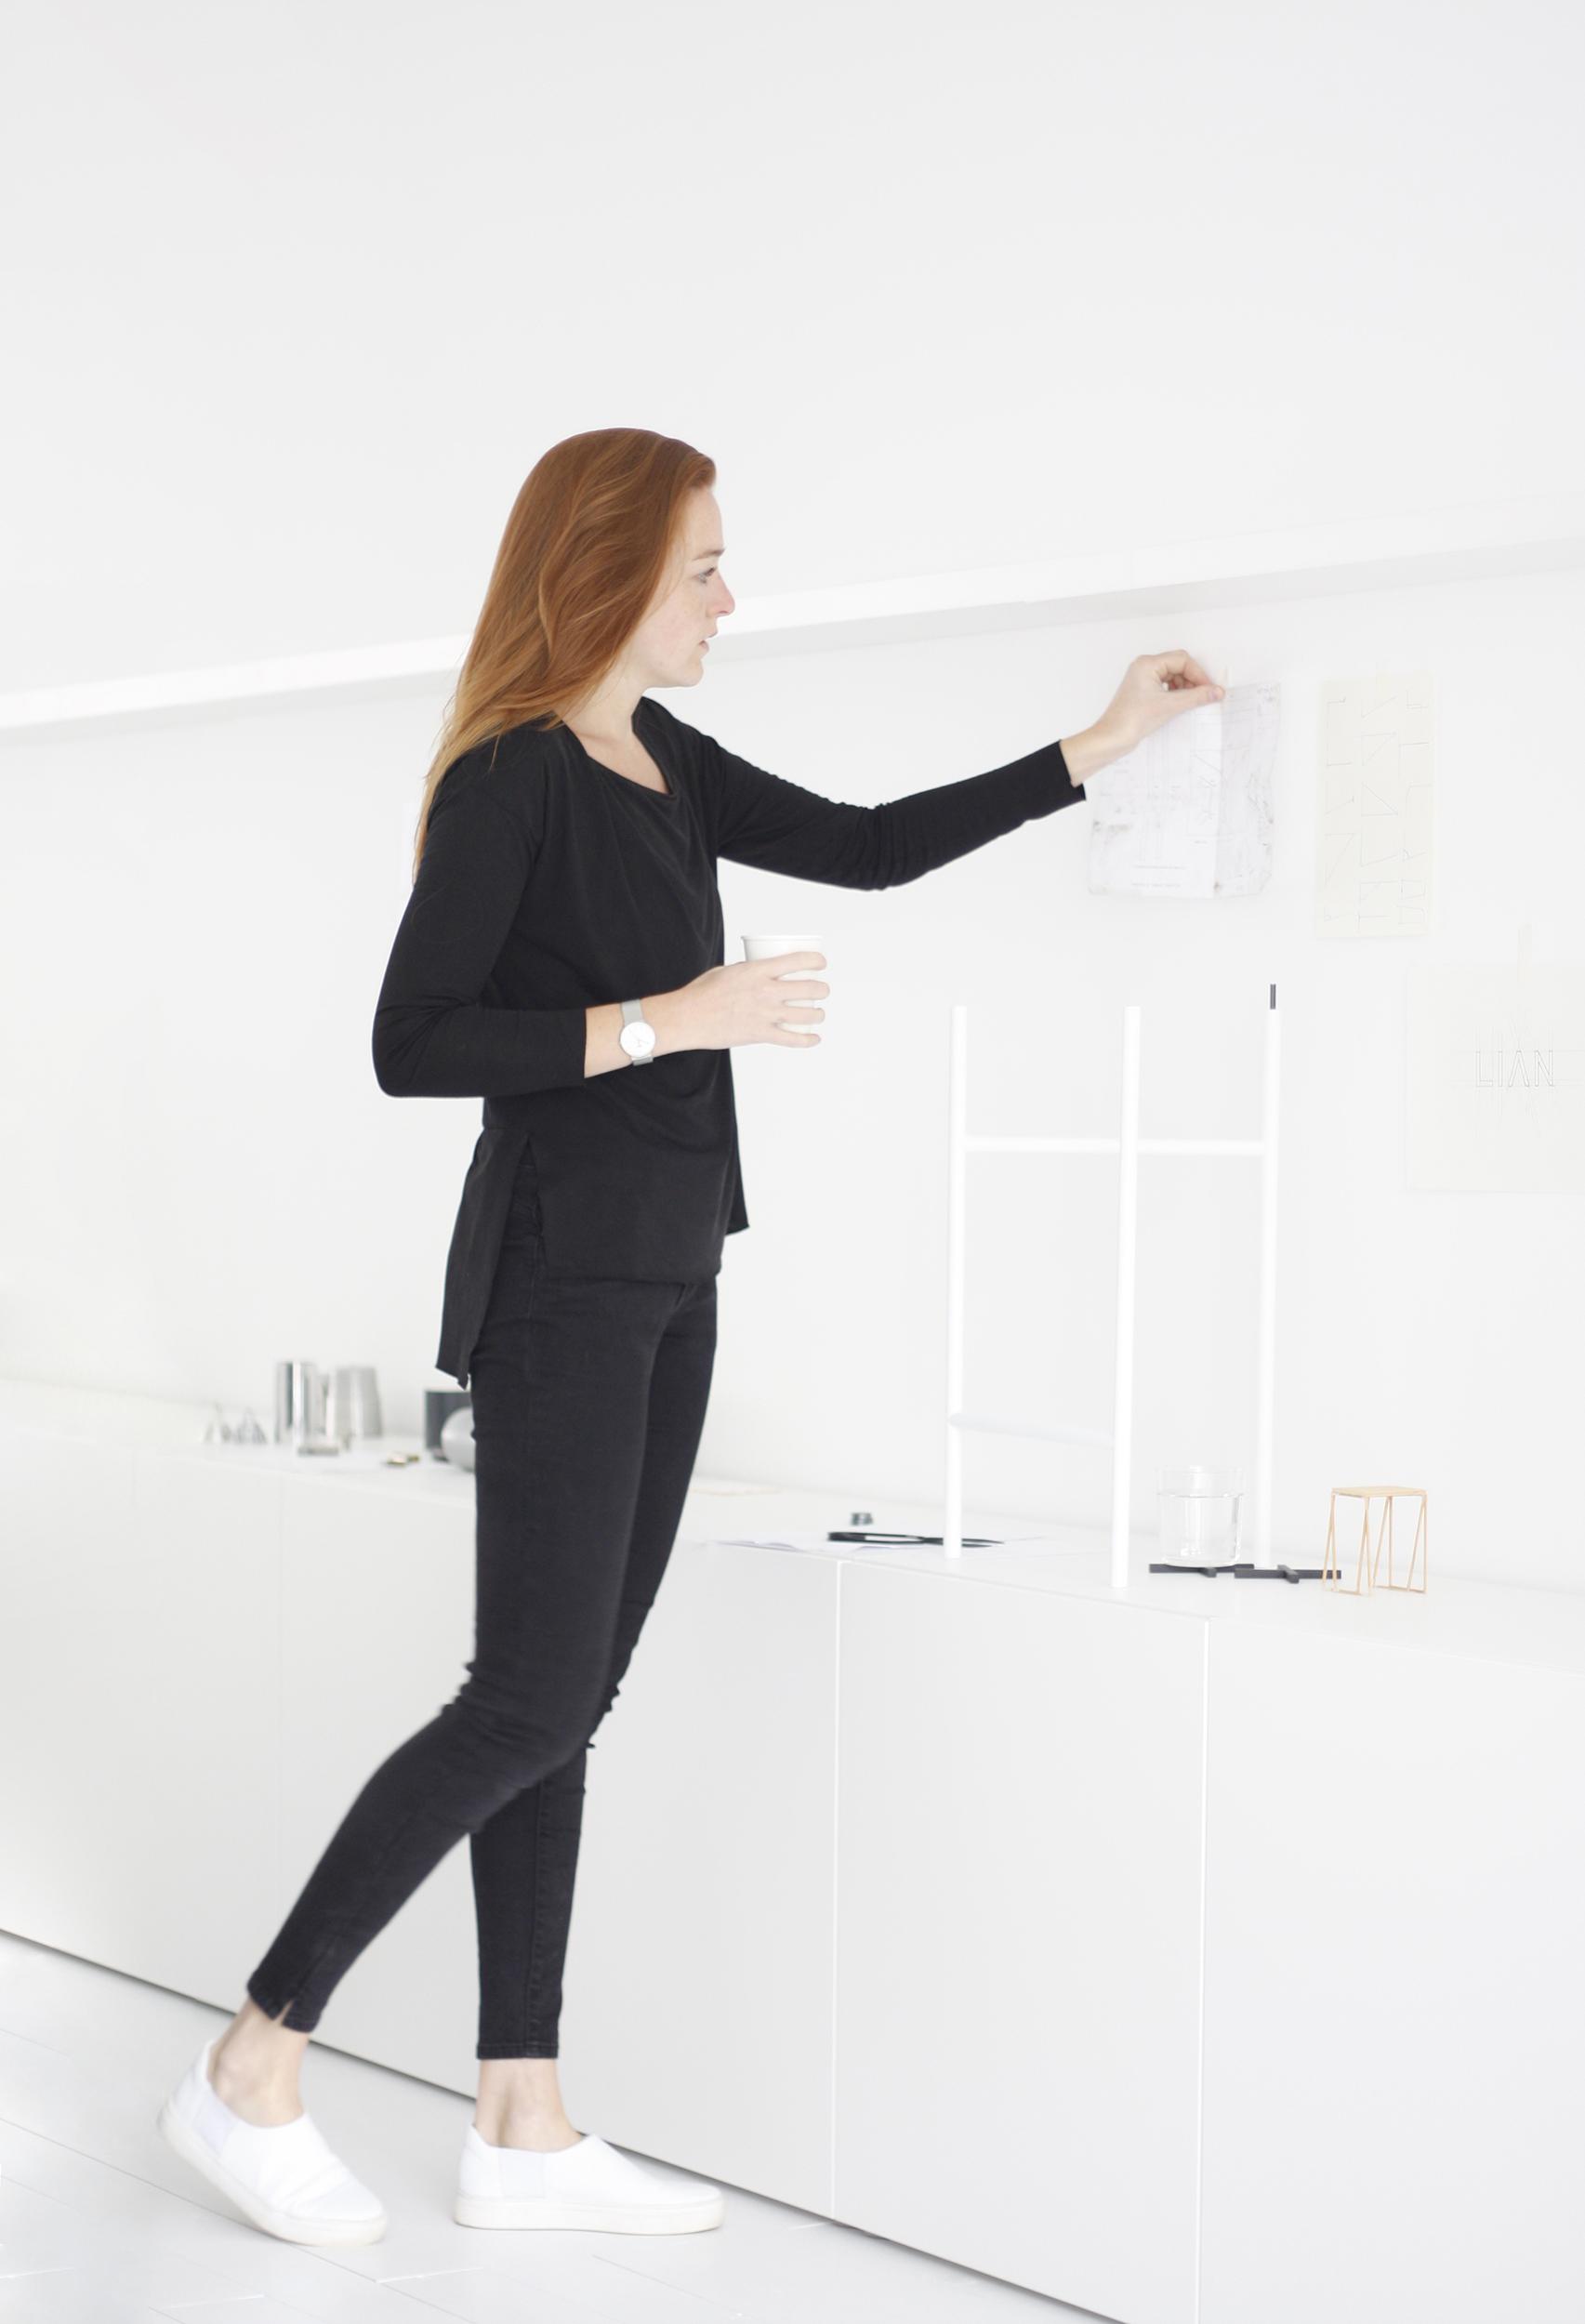 LIAN product designer studio works